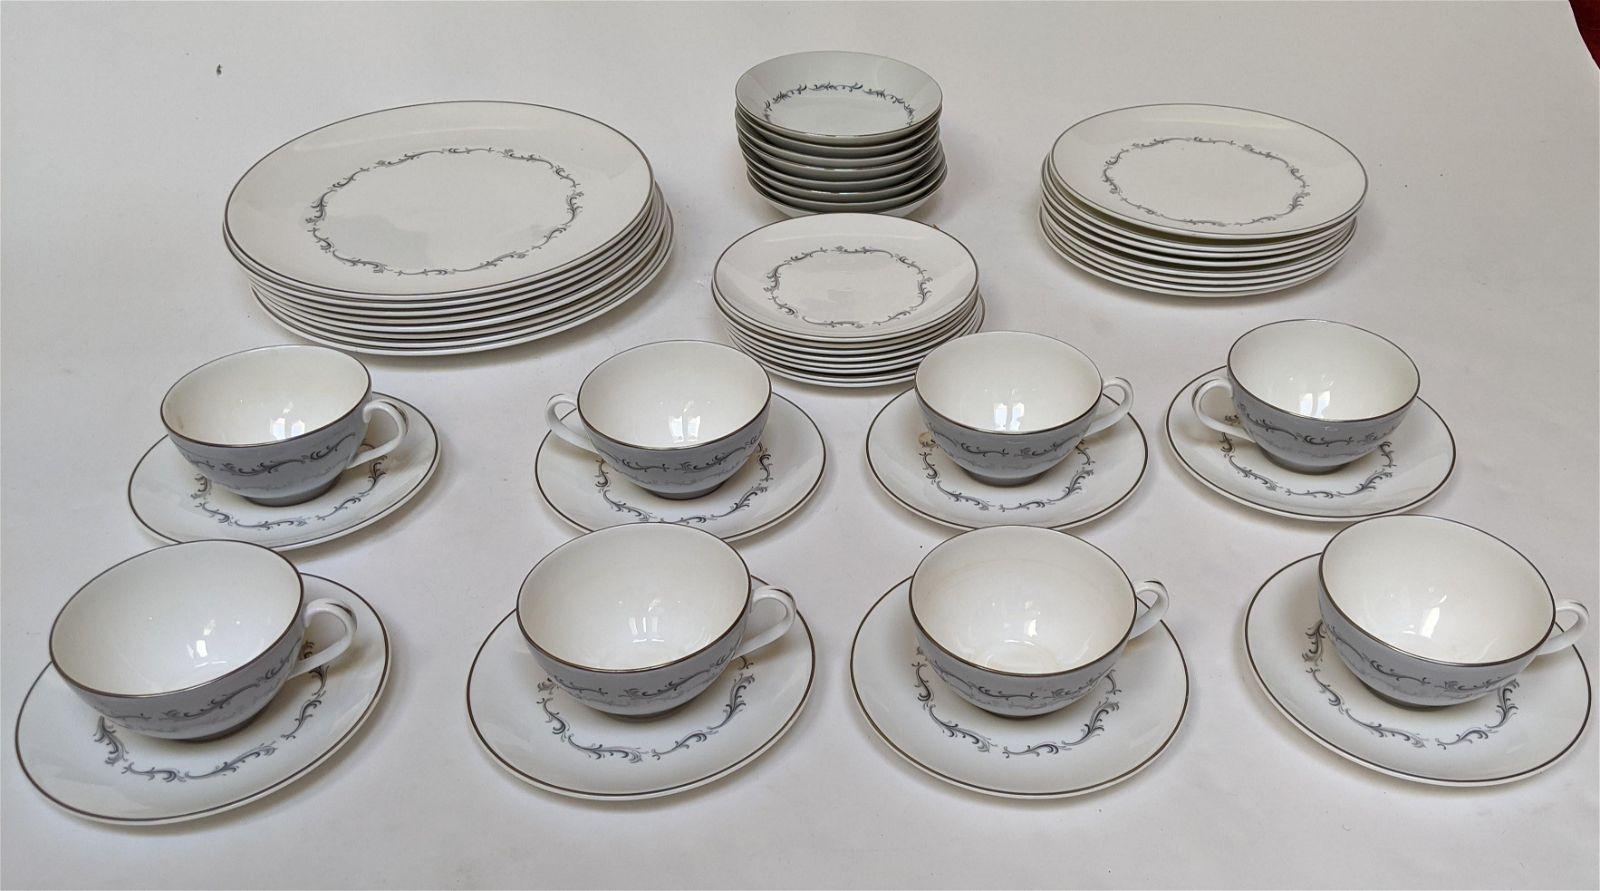 48-Pc Royal Doulton Dinner Set